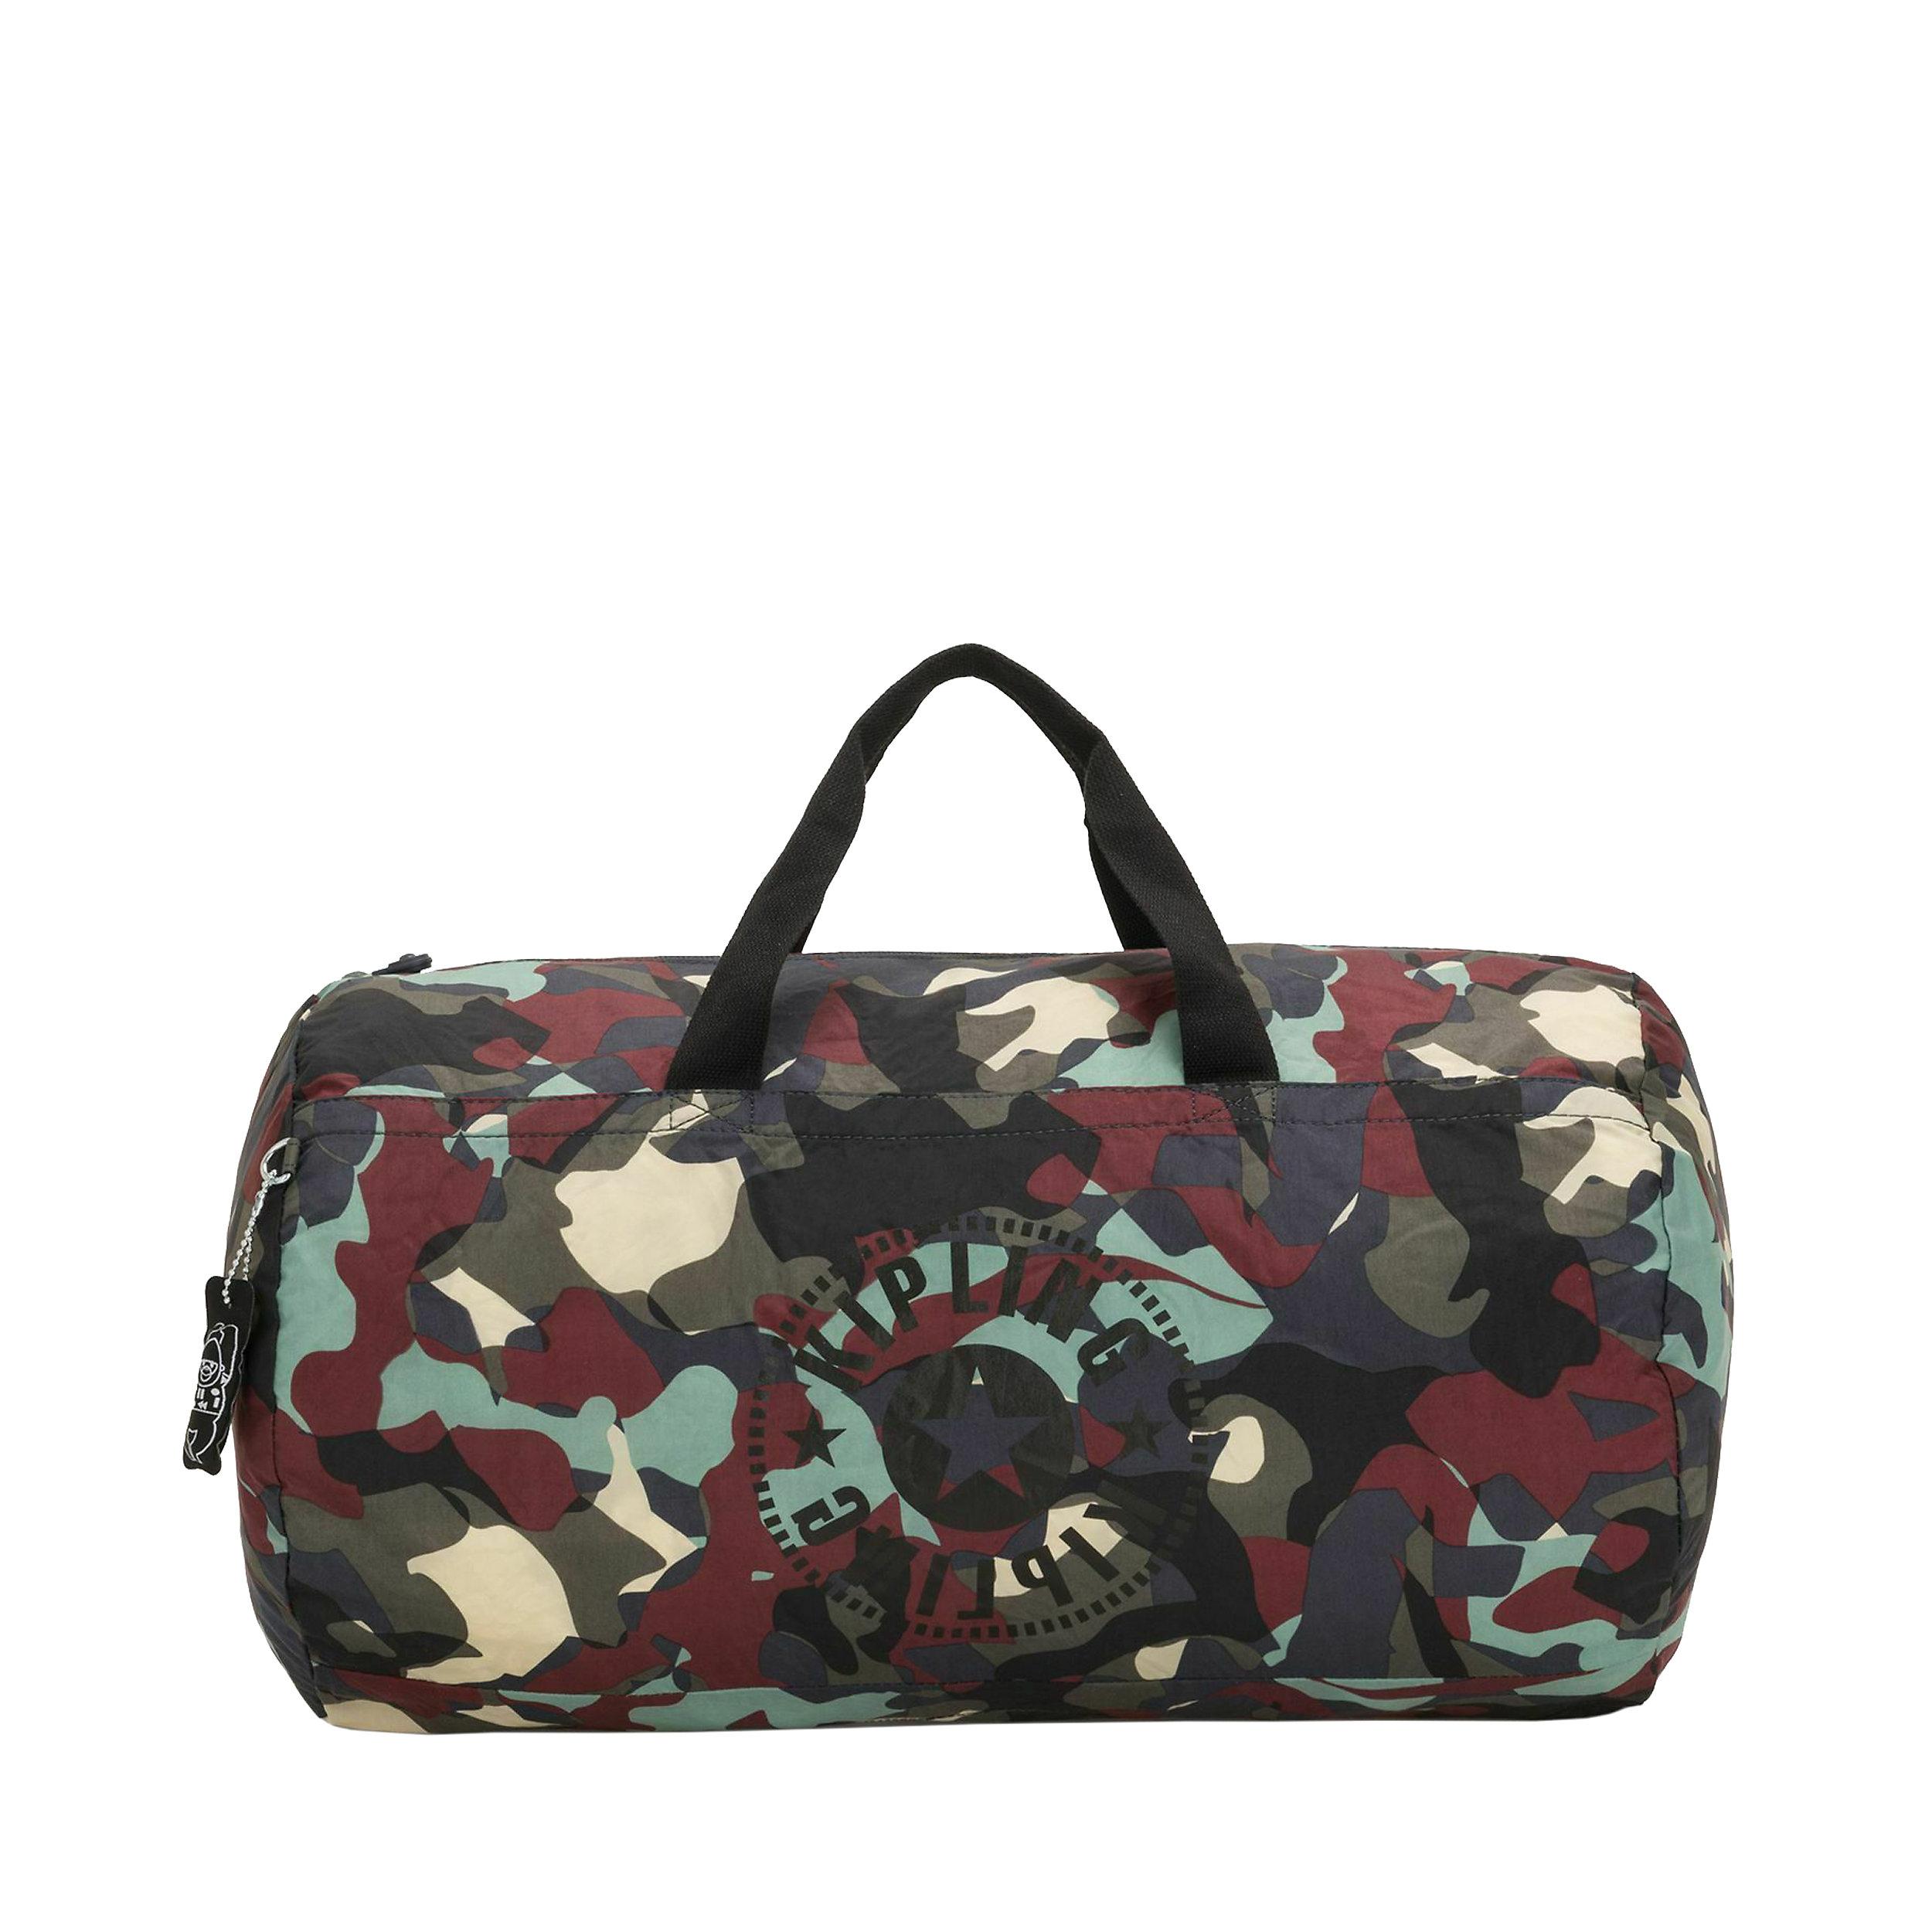 Sporttasche Onalo Packable Bags 25 Liter